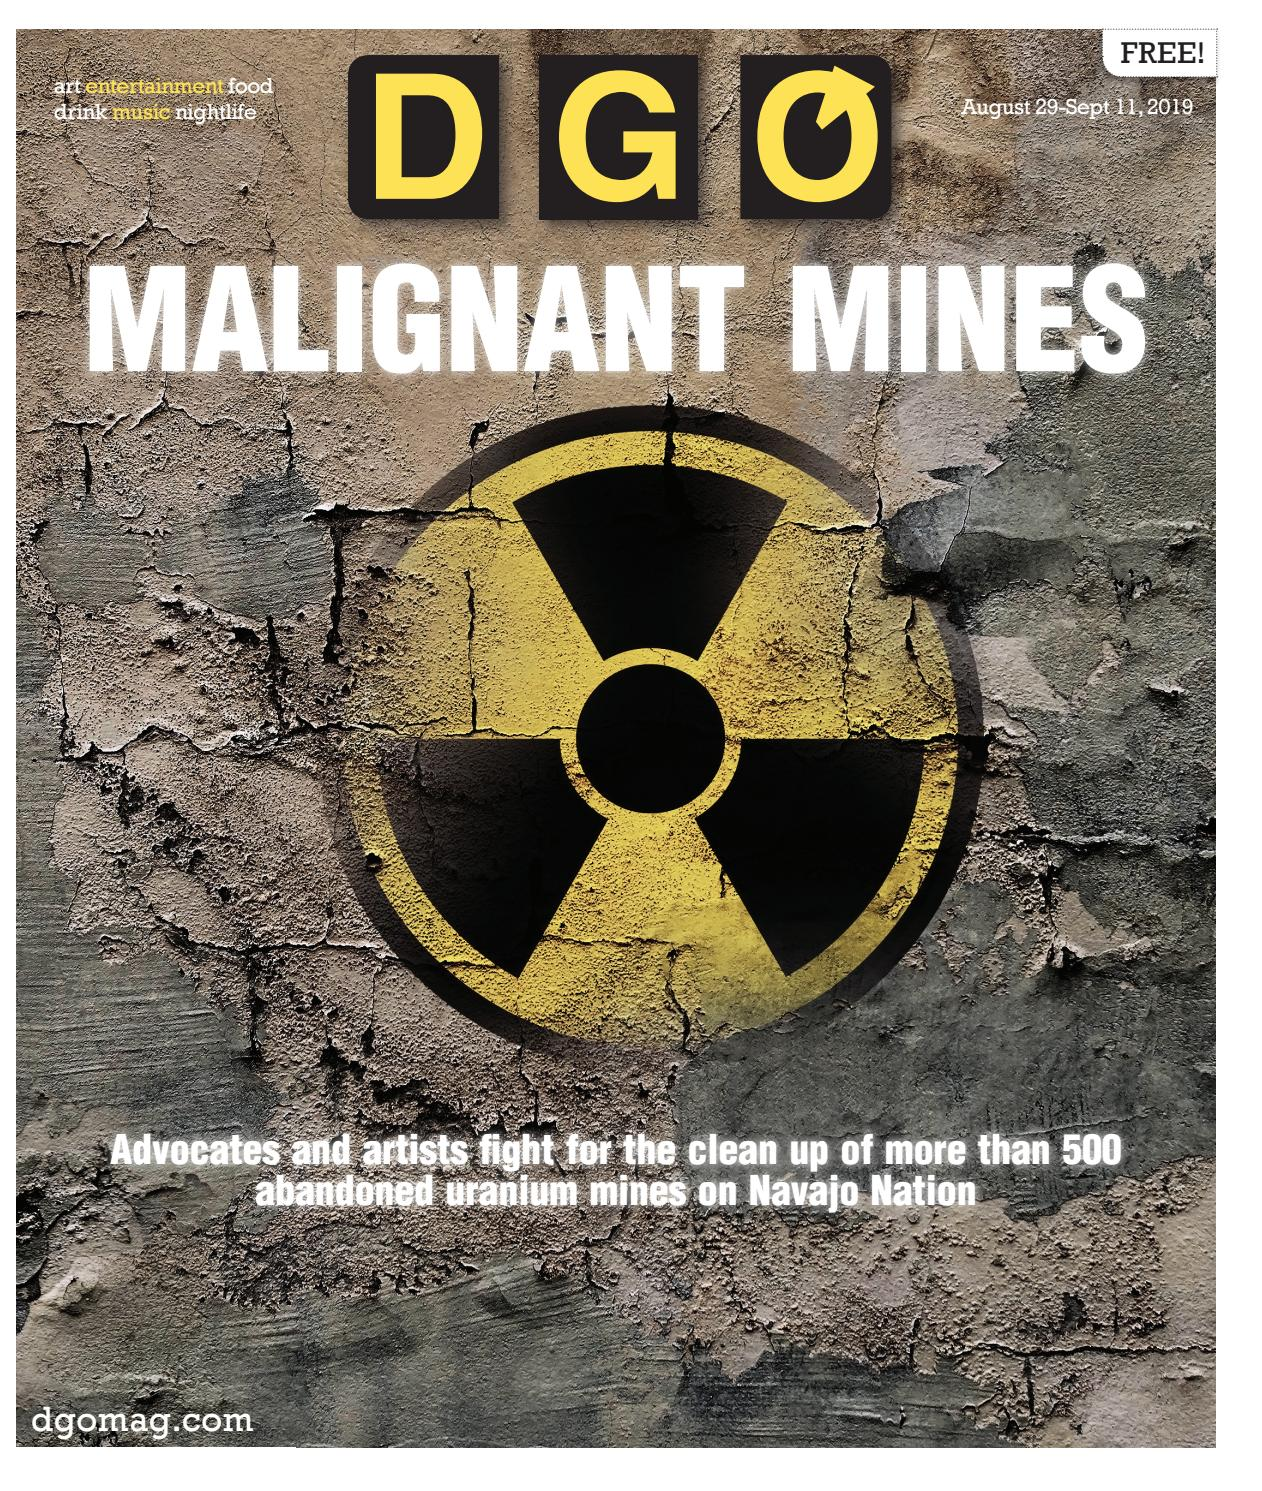 DGO - Malignant Mines by Ballantine Communications - issuu